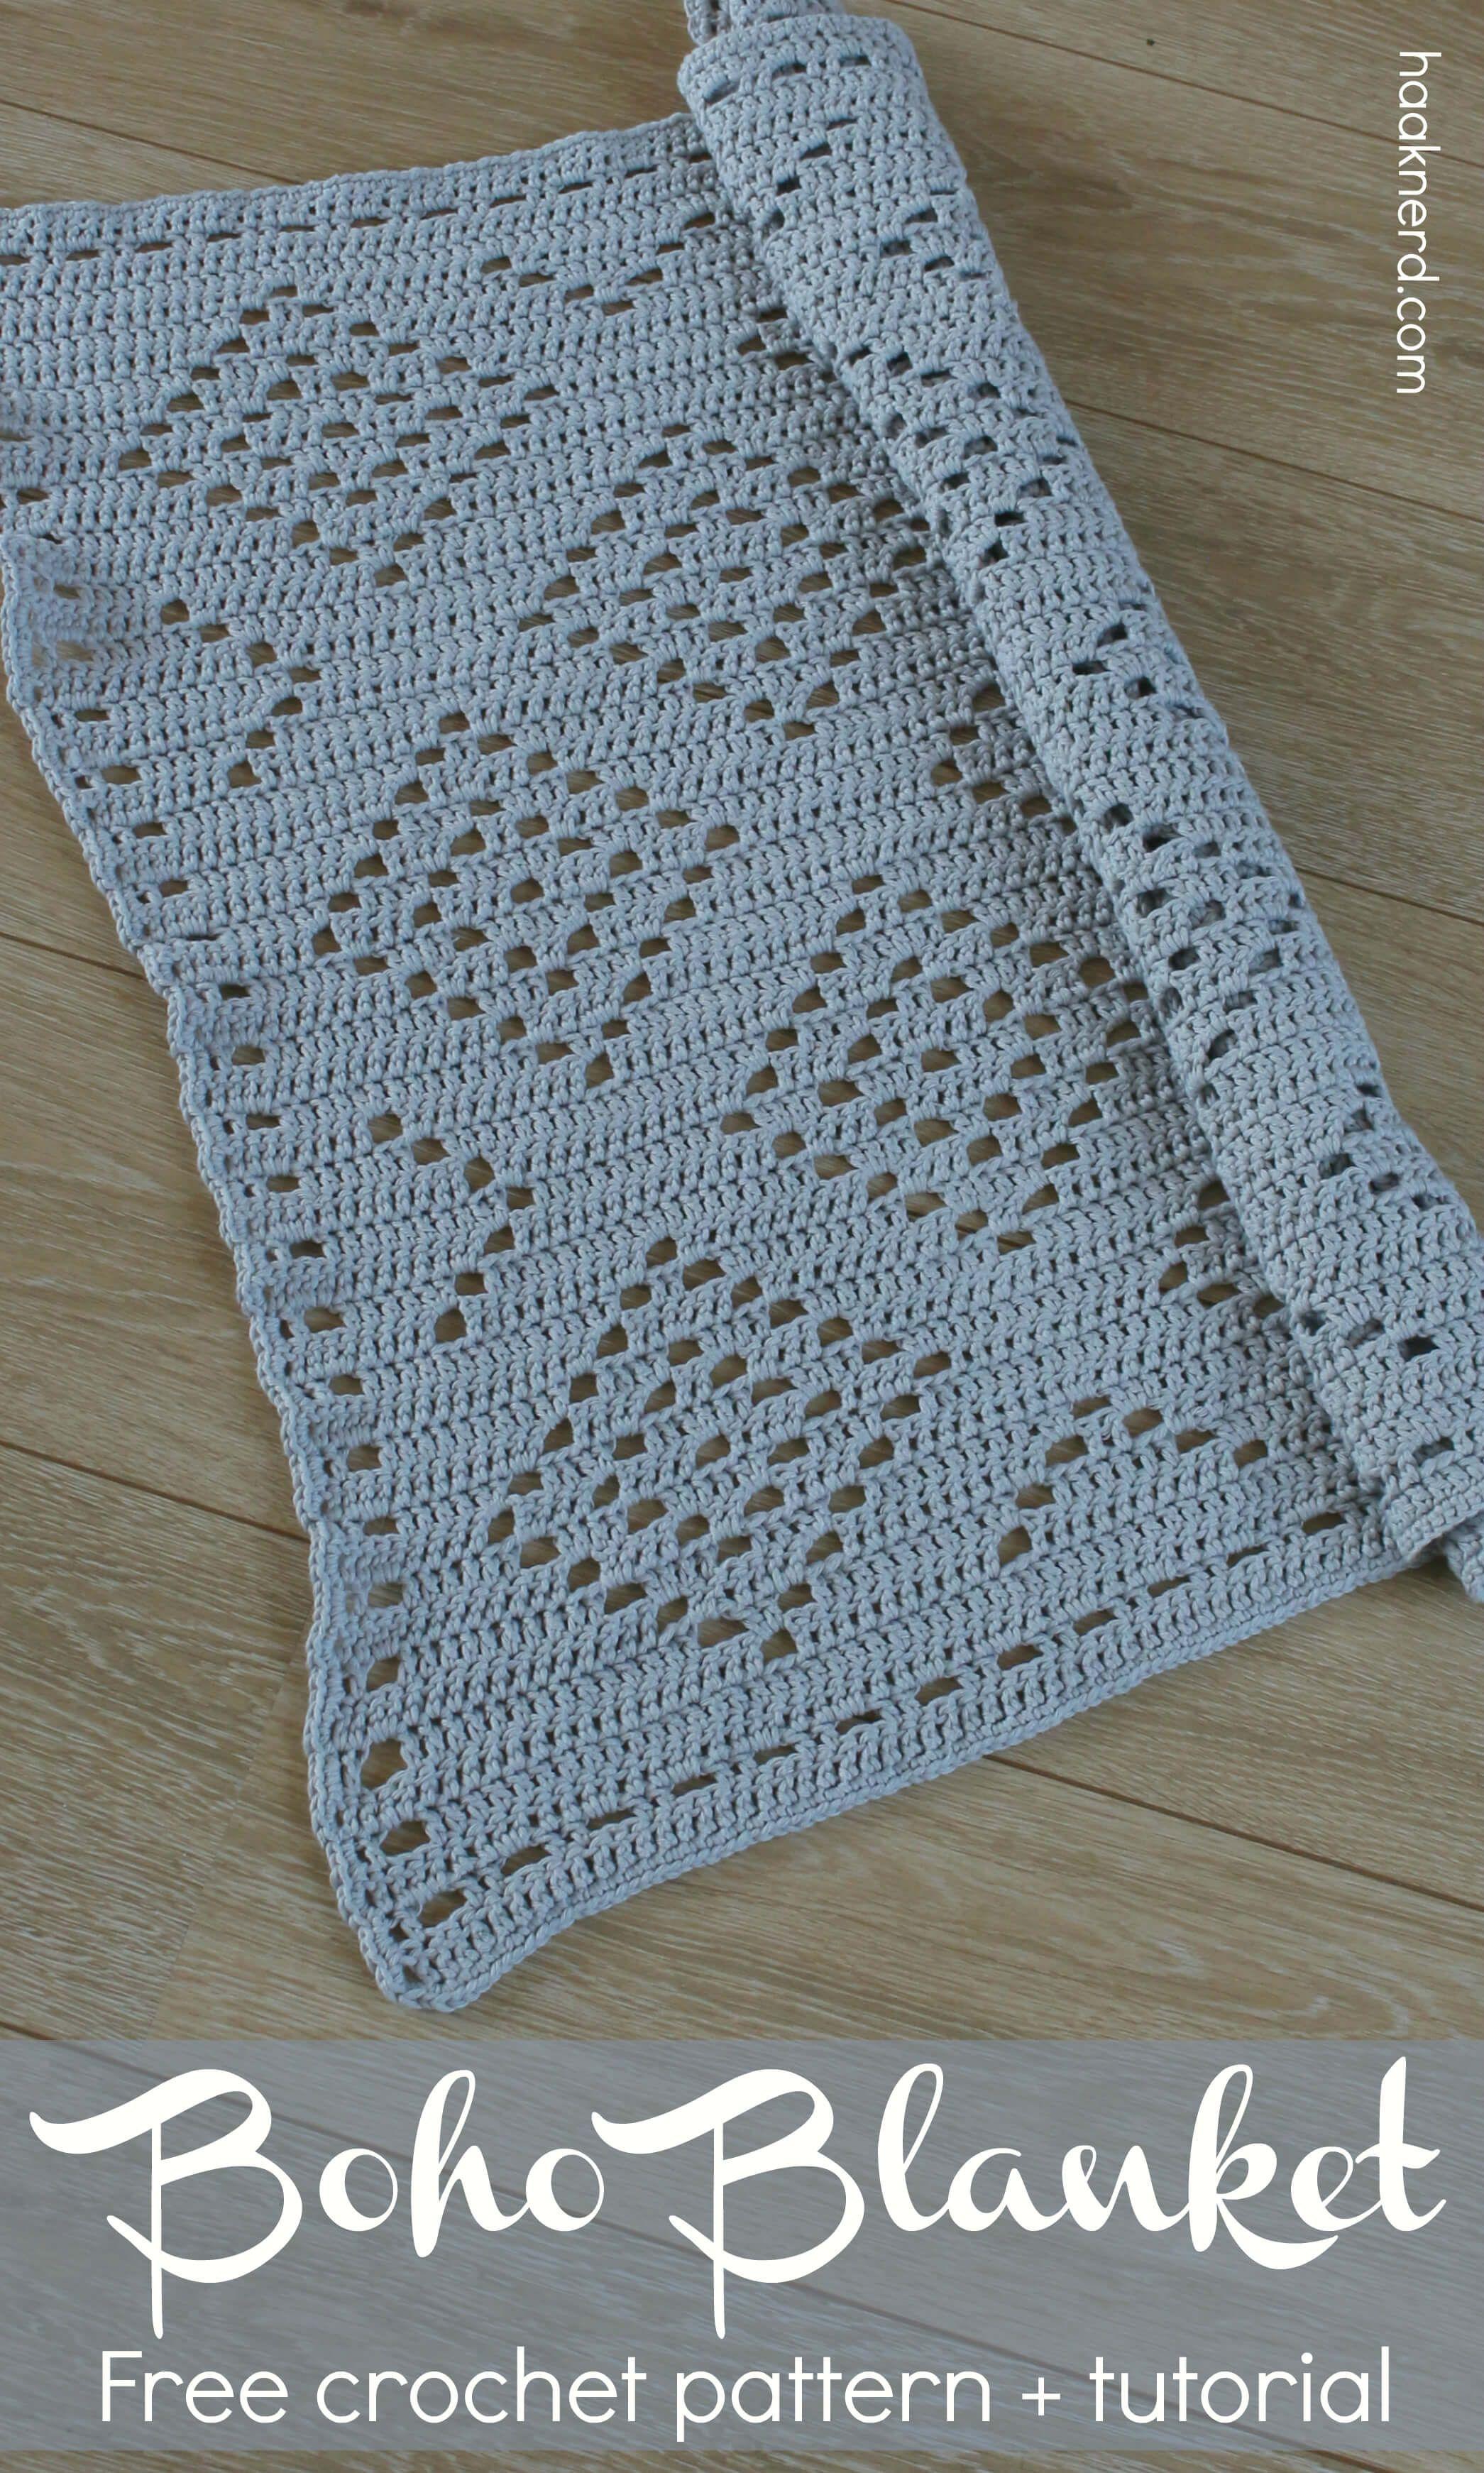 Boho Baby Blanket. | Boho baby, Filet crochet and Blanket